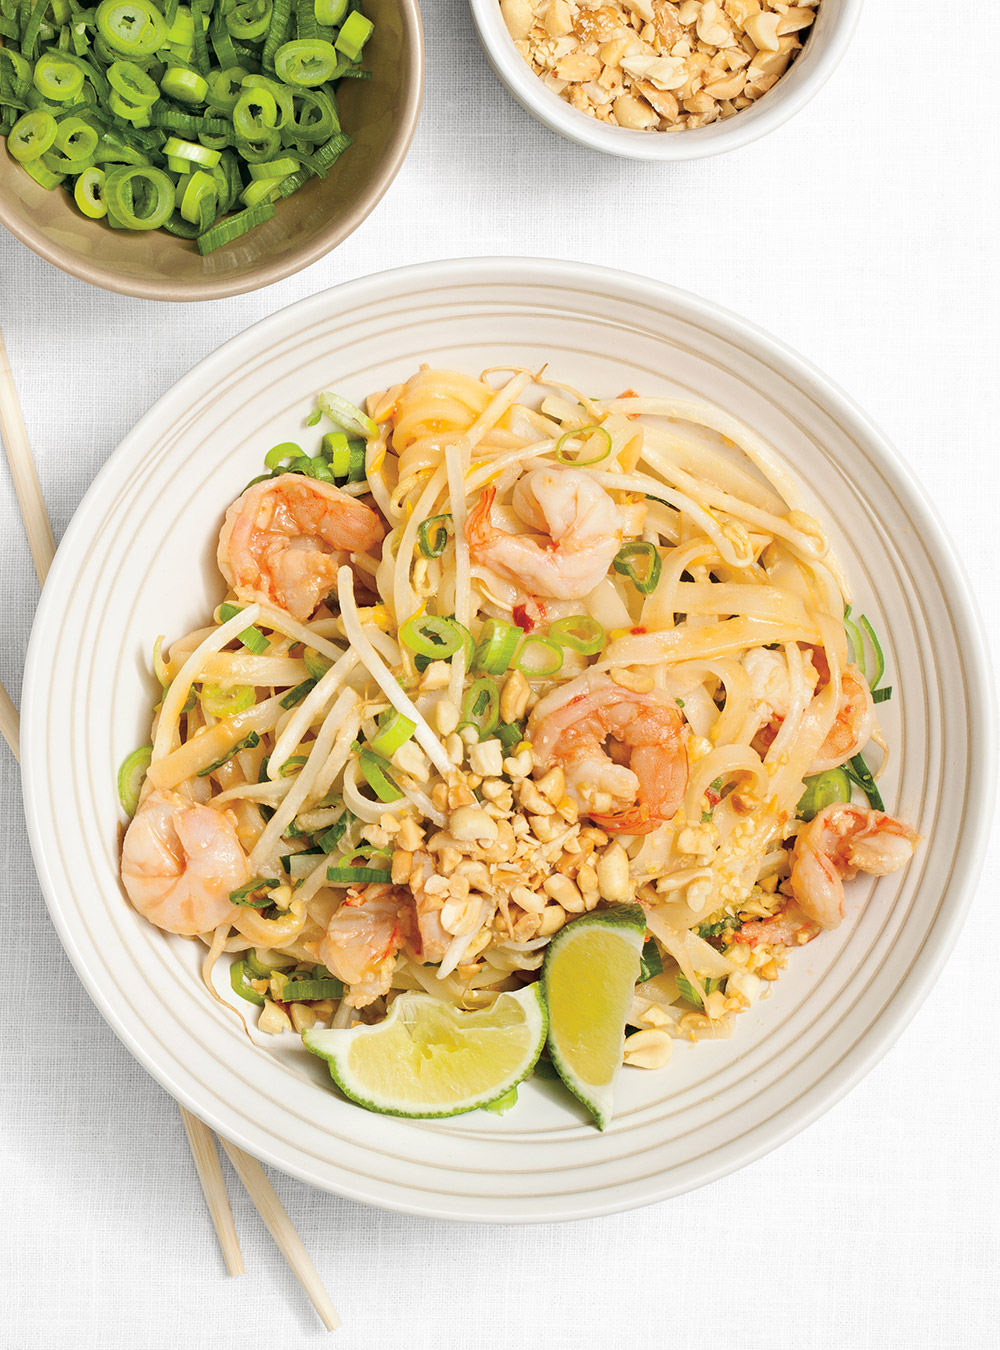 Pad tha aux crevettes ricardo for Cuisine ricardo